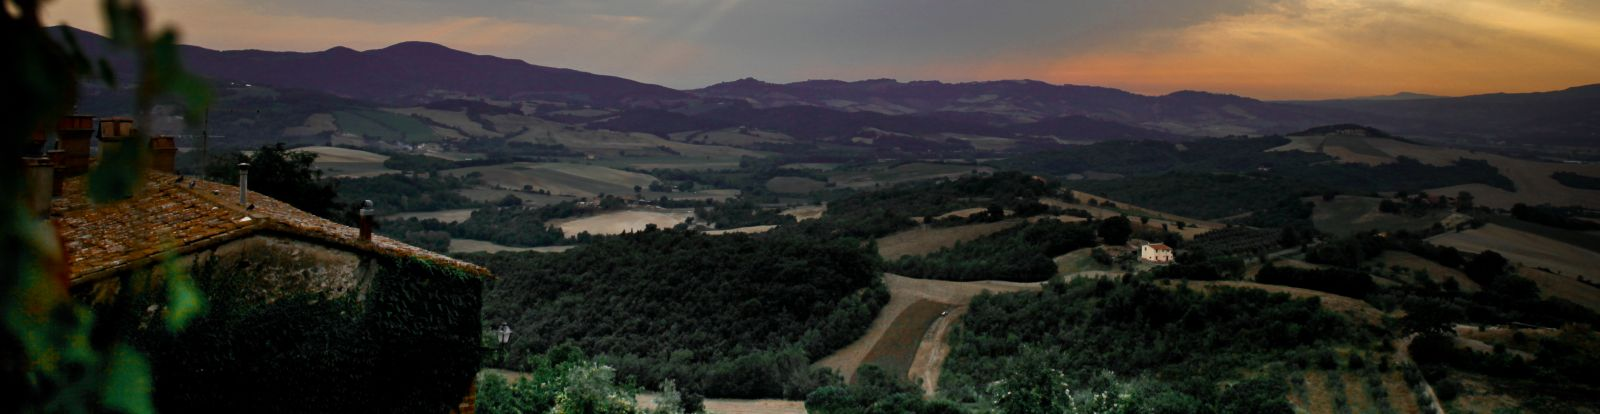 Panorama da Vinícola